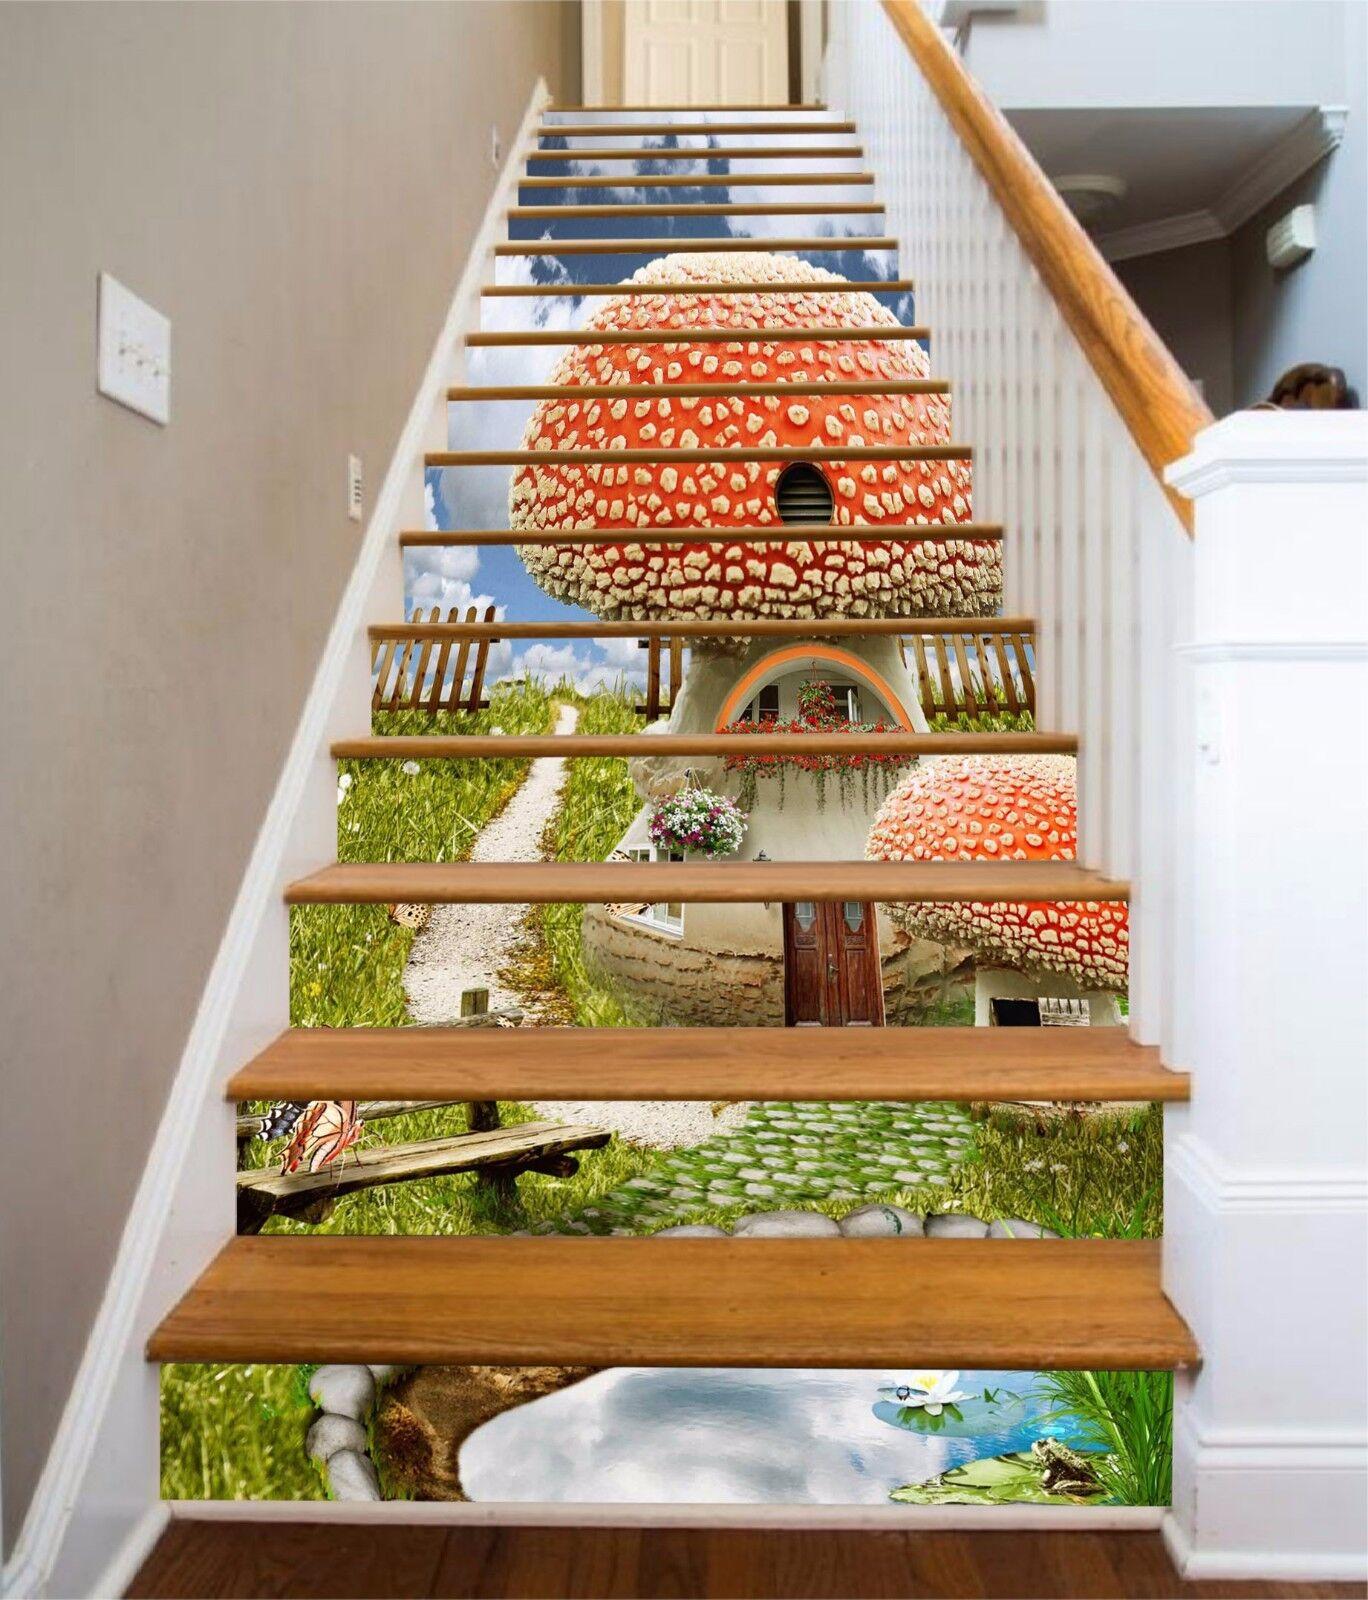 3D Mushroom alley 7 Stair Risers Decoration Photo Mural Vinyl Decal Wallpaper UK